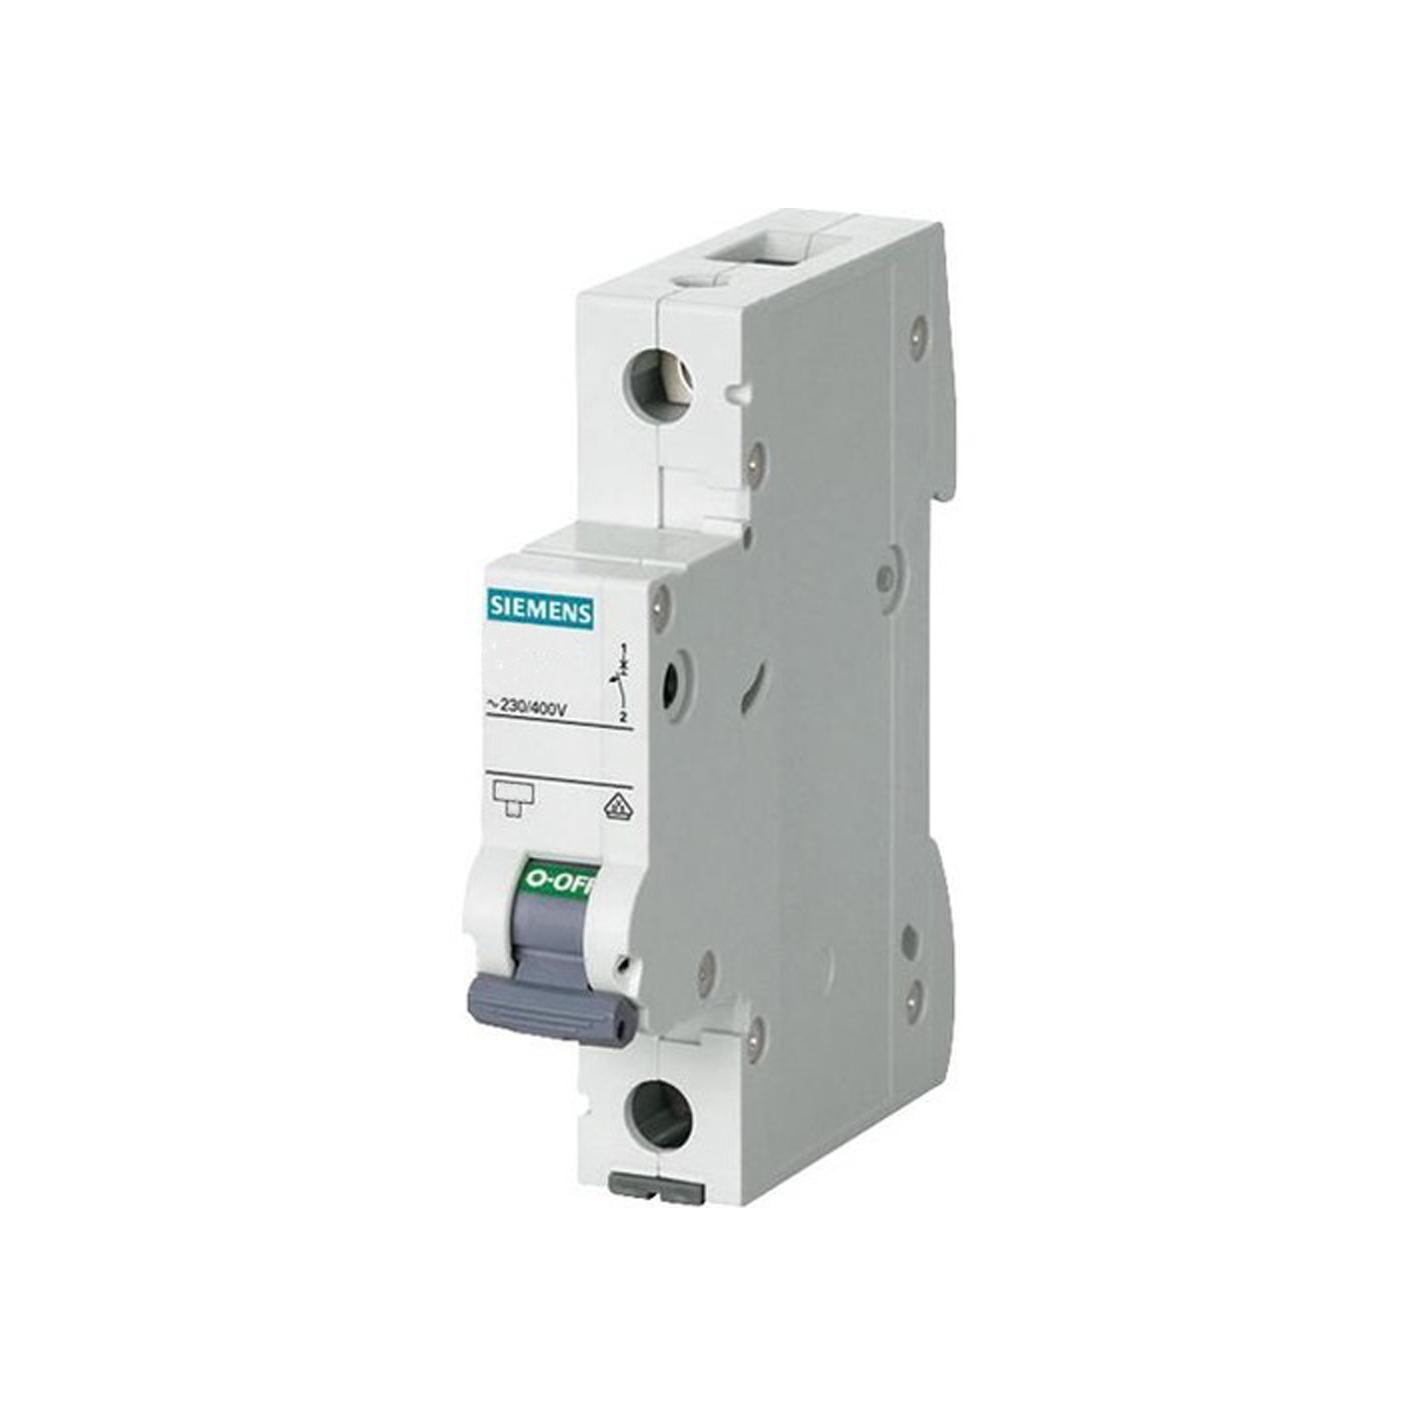 Siemens 1x50A Otomatik Sigorta